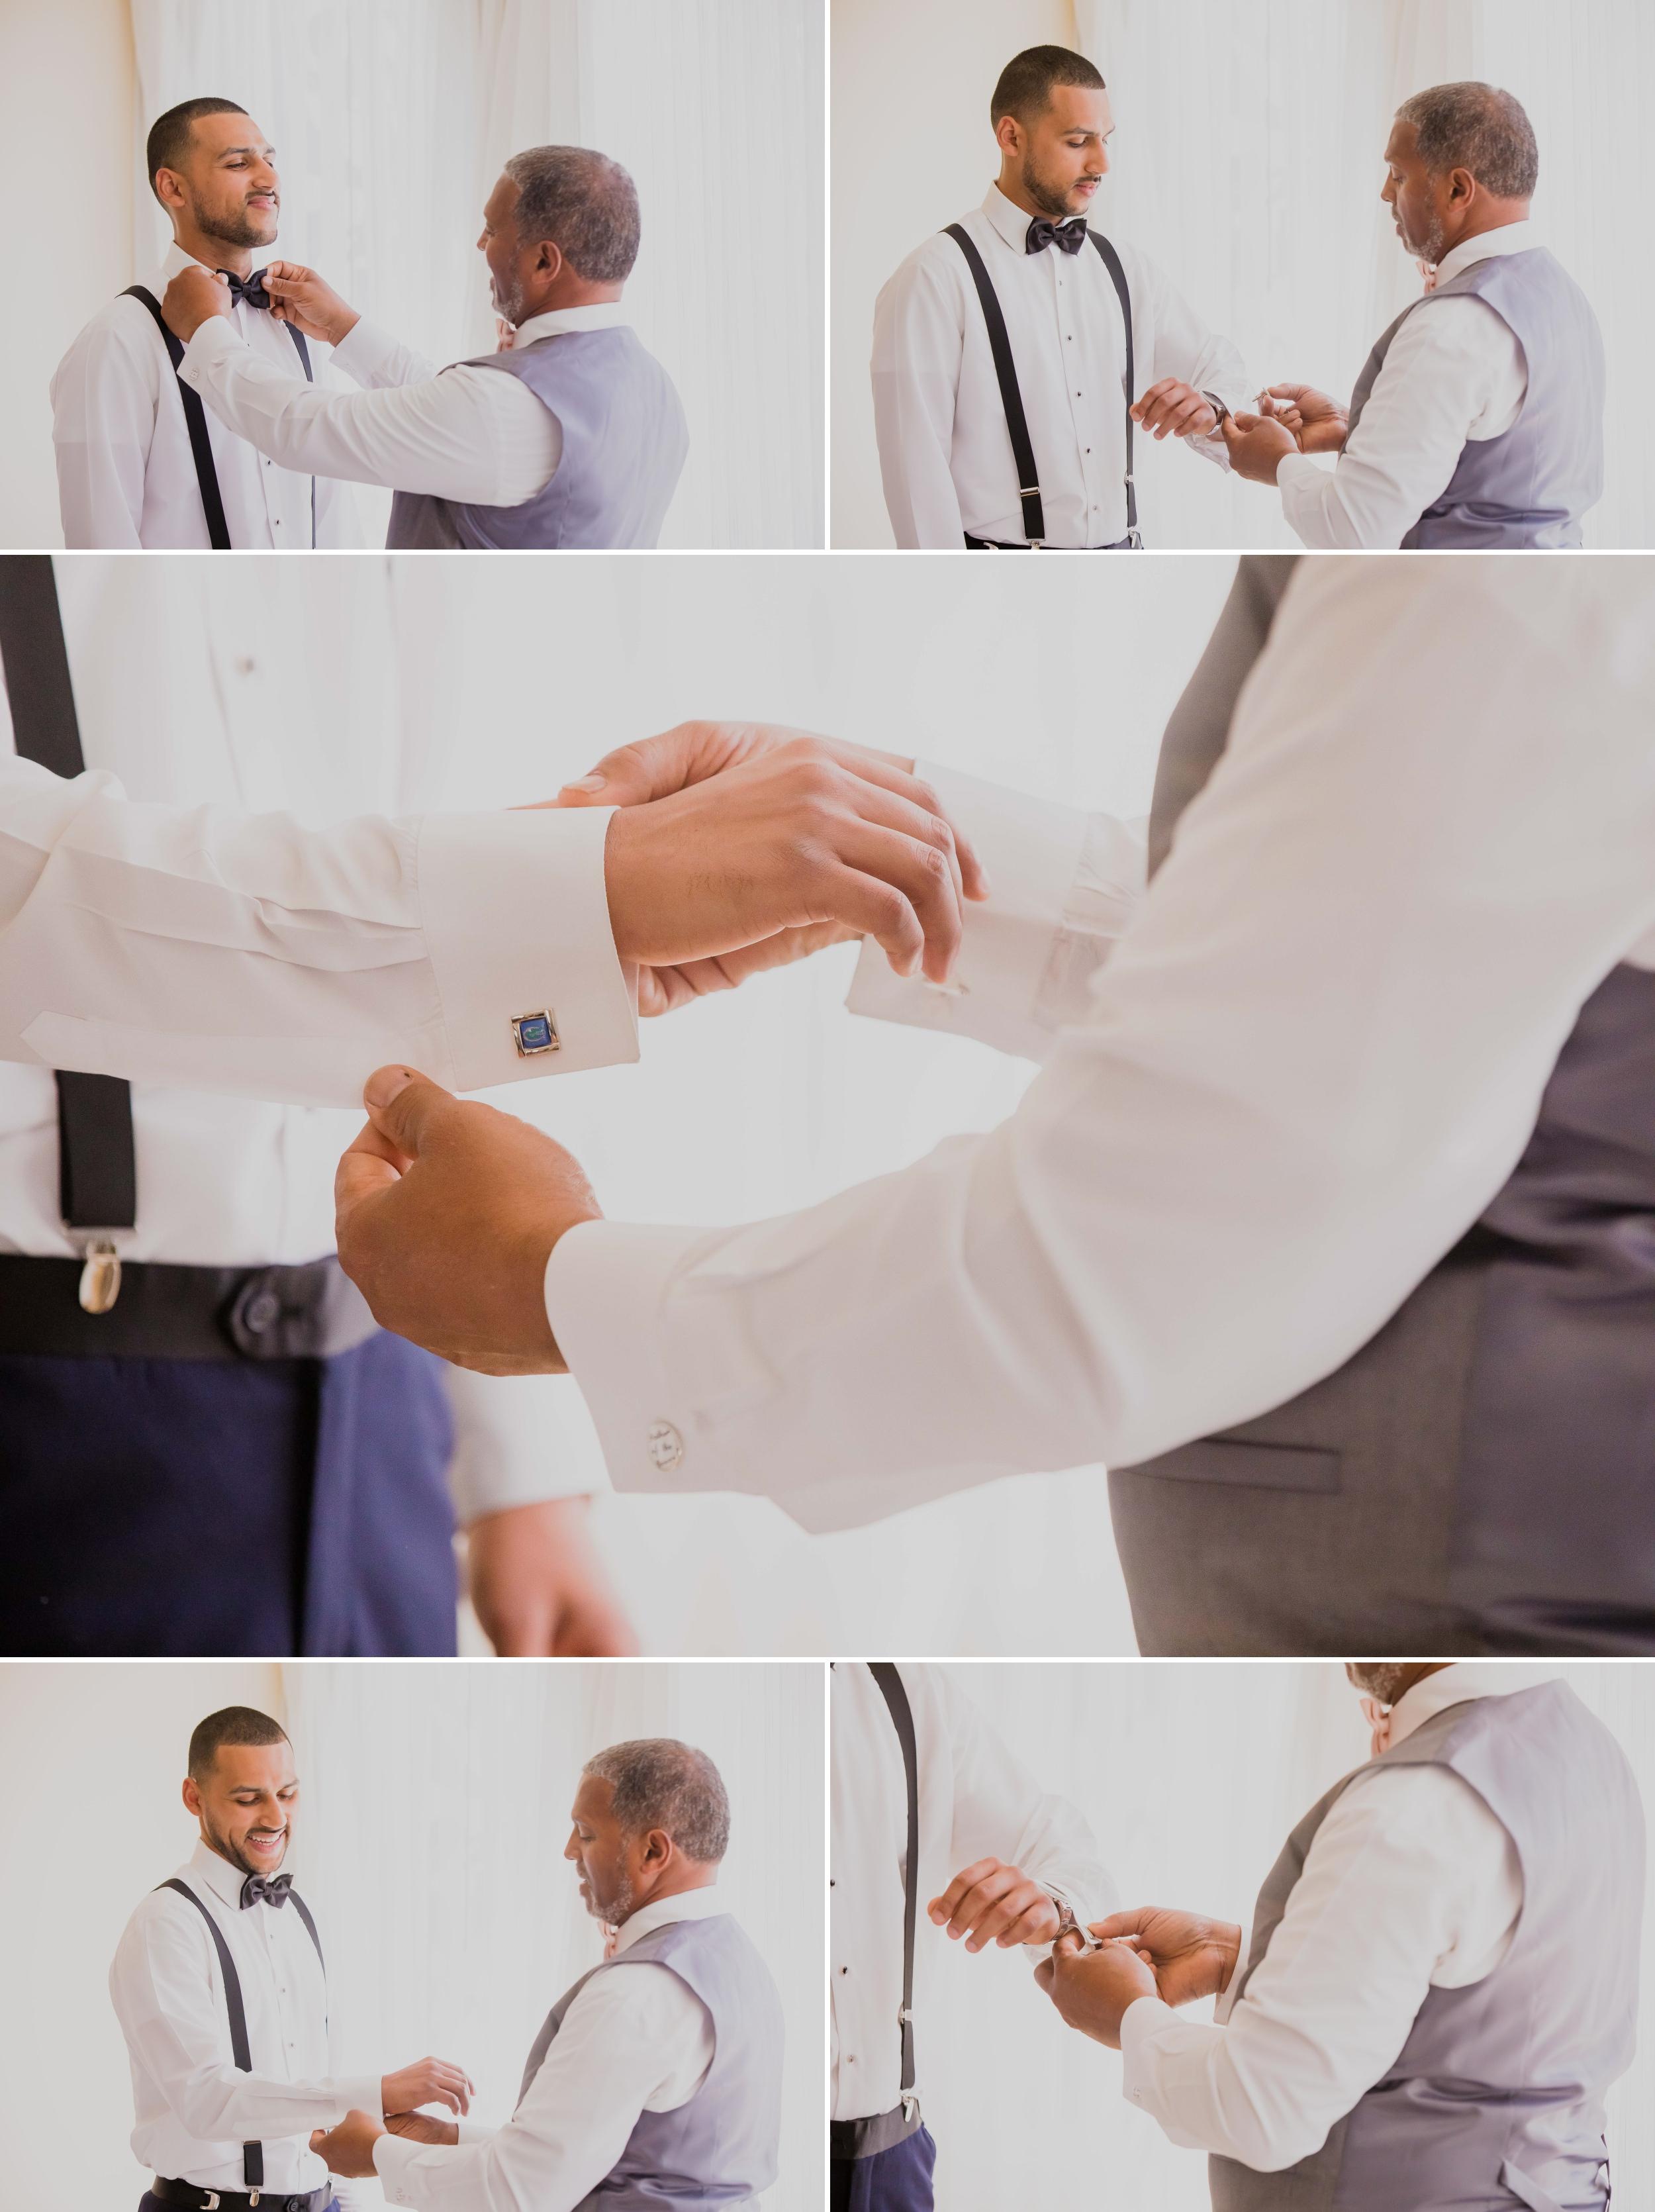 Wedding - Rusty Pelican - Key Biscayne - Santy Martinez Photography 7.jpg